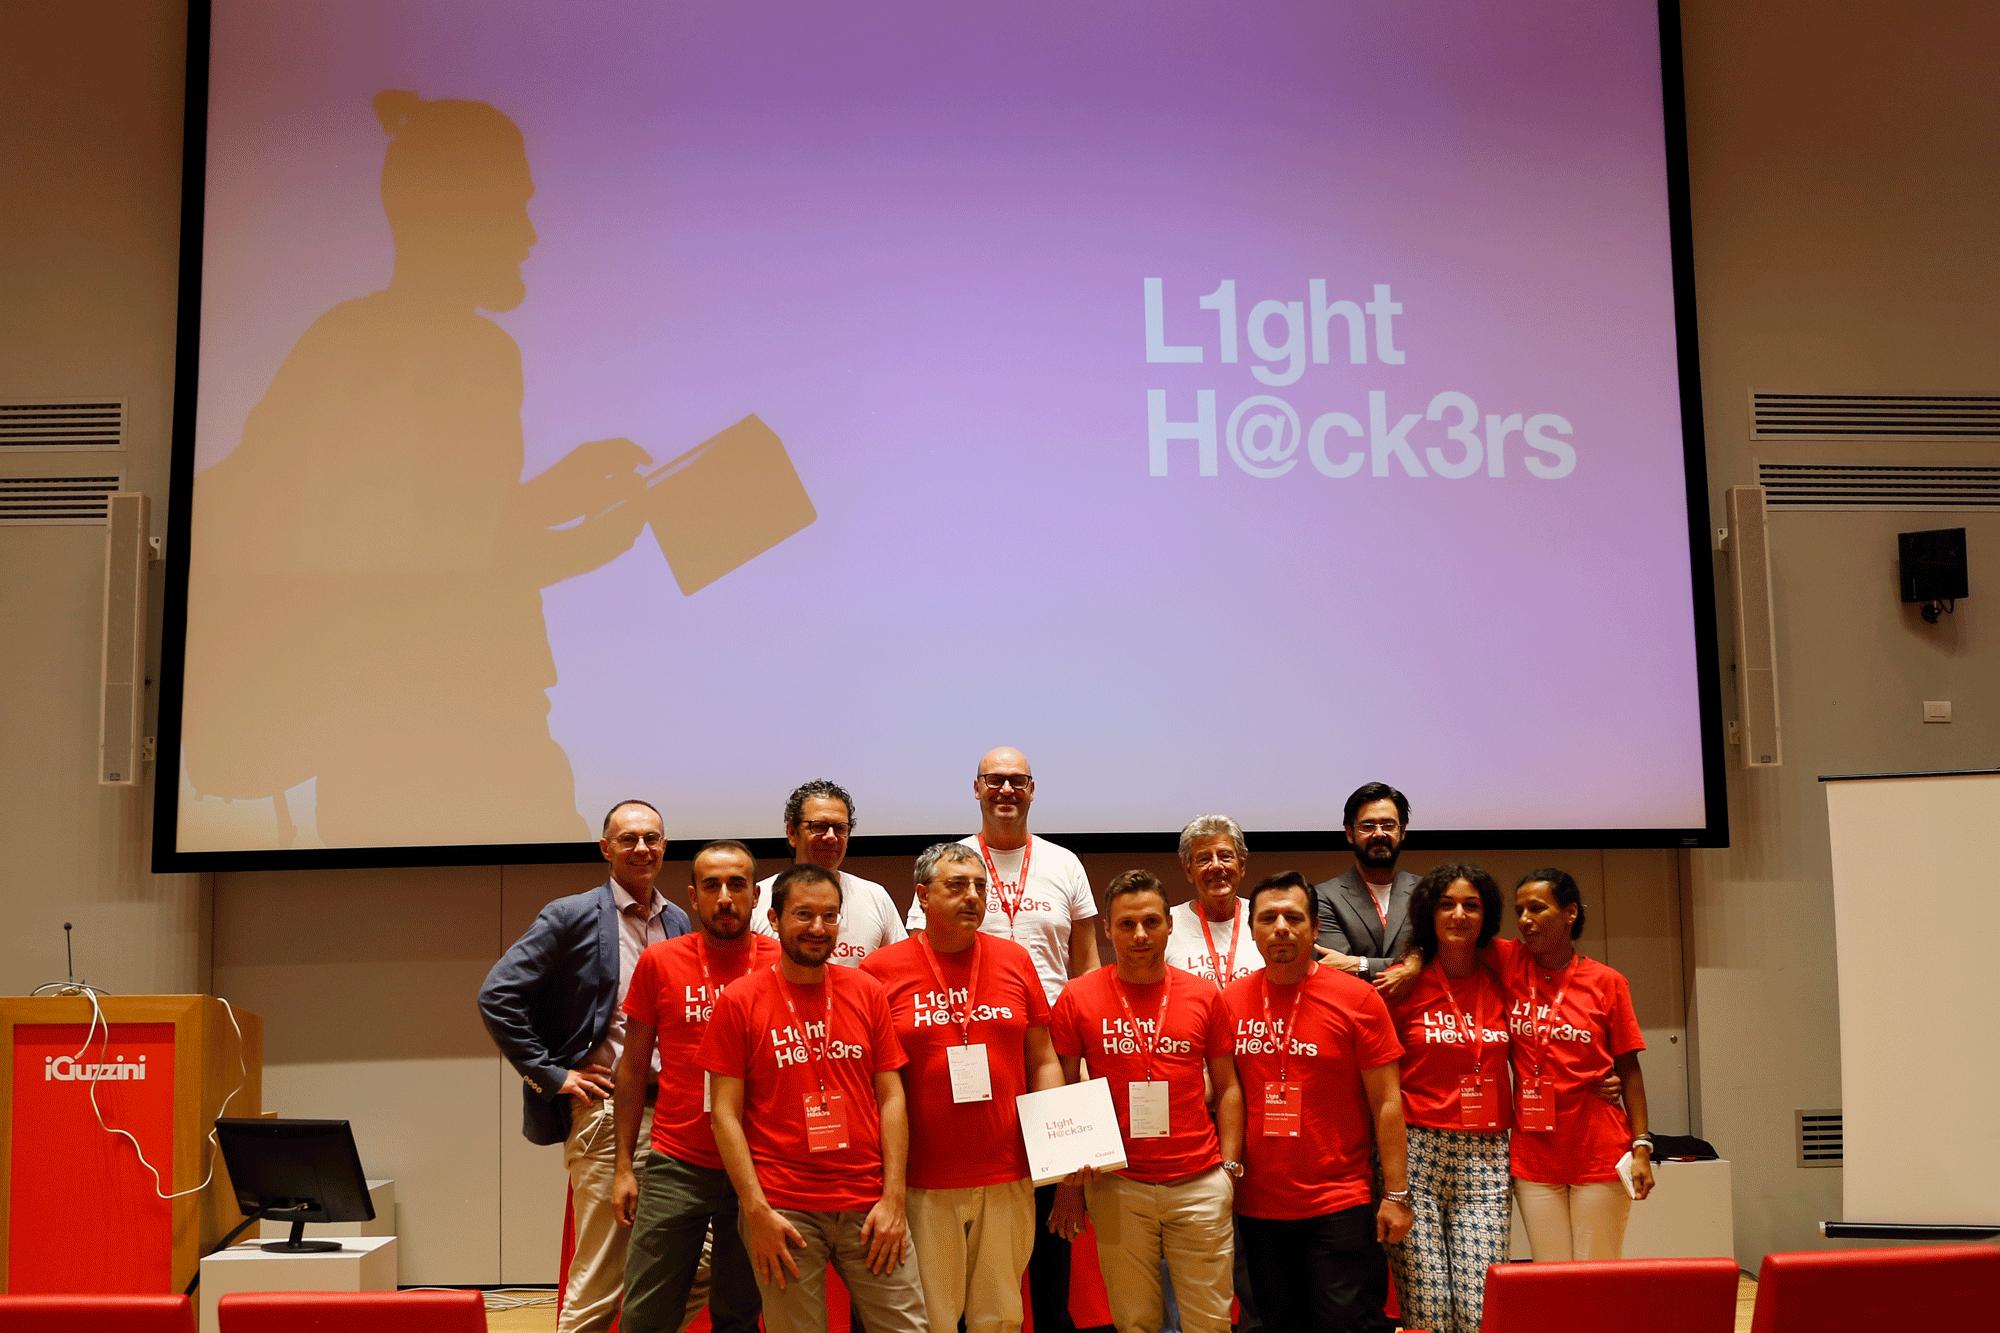 LightHackers, iGuzzini's Hackathon reward innovation